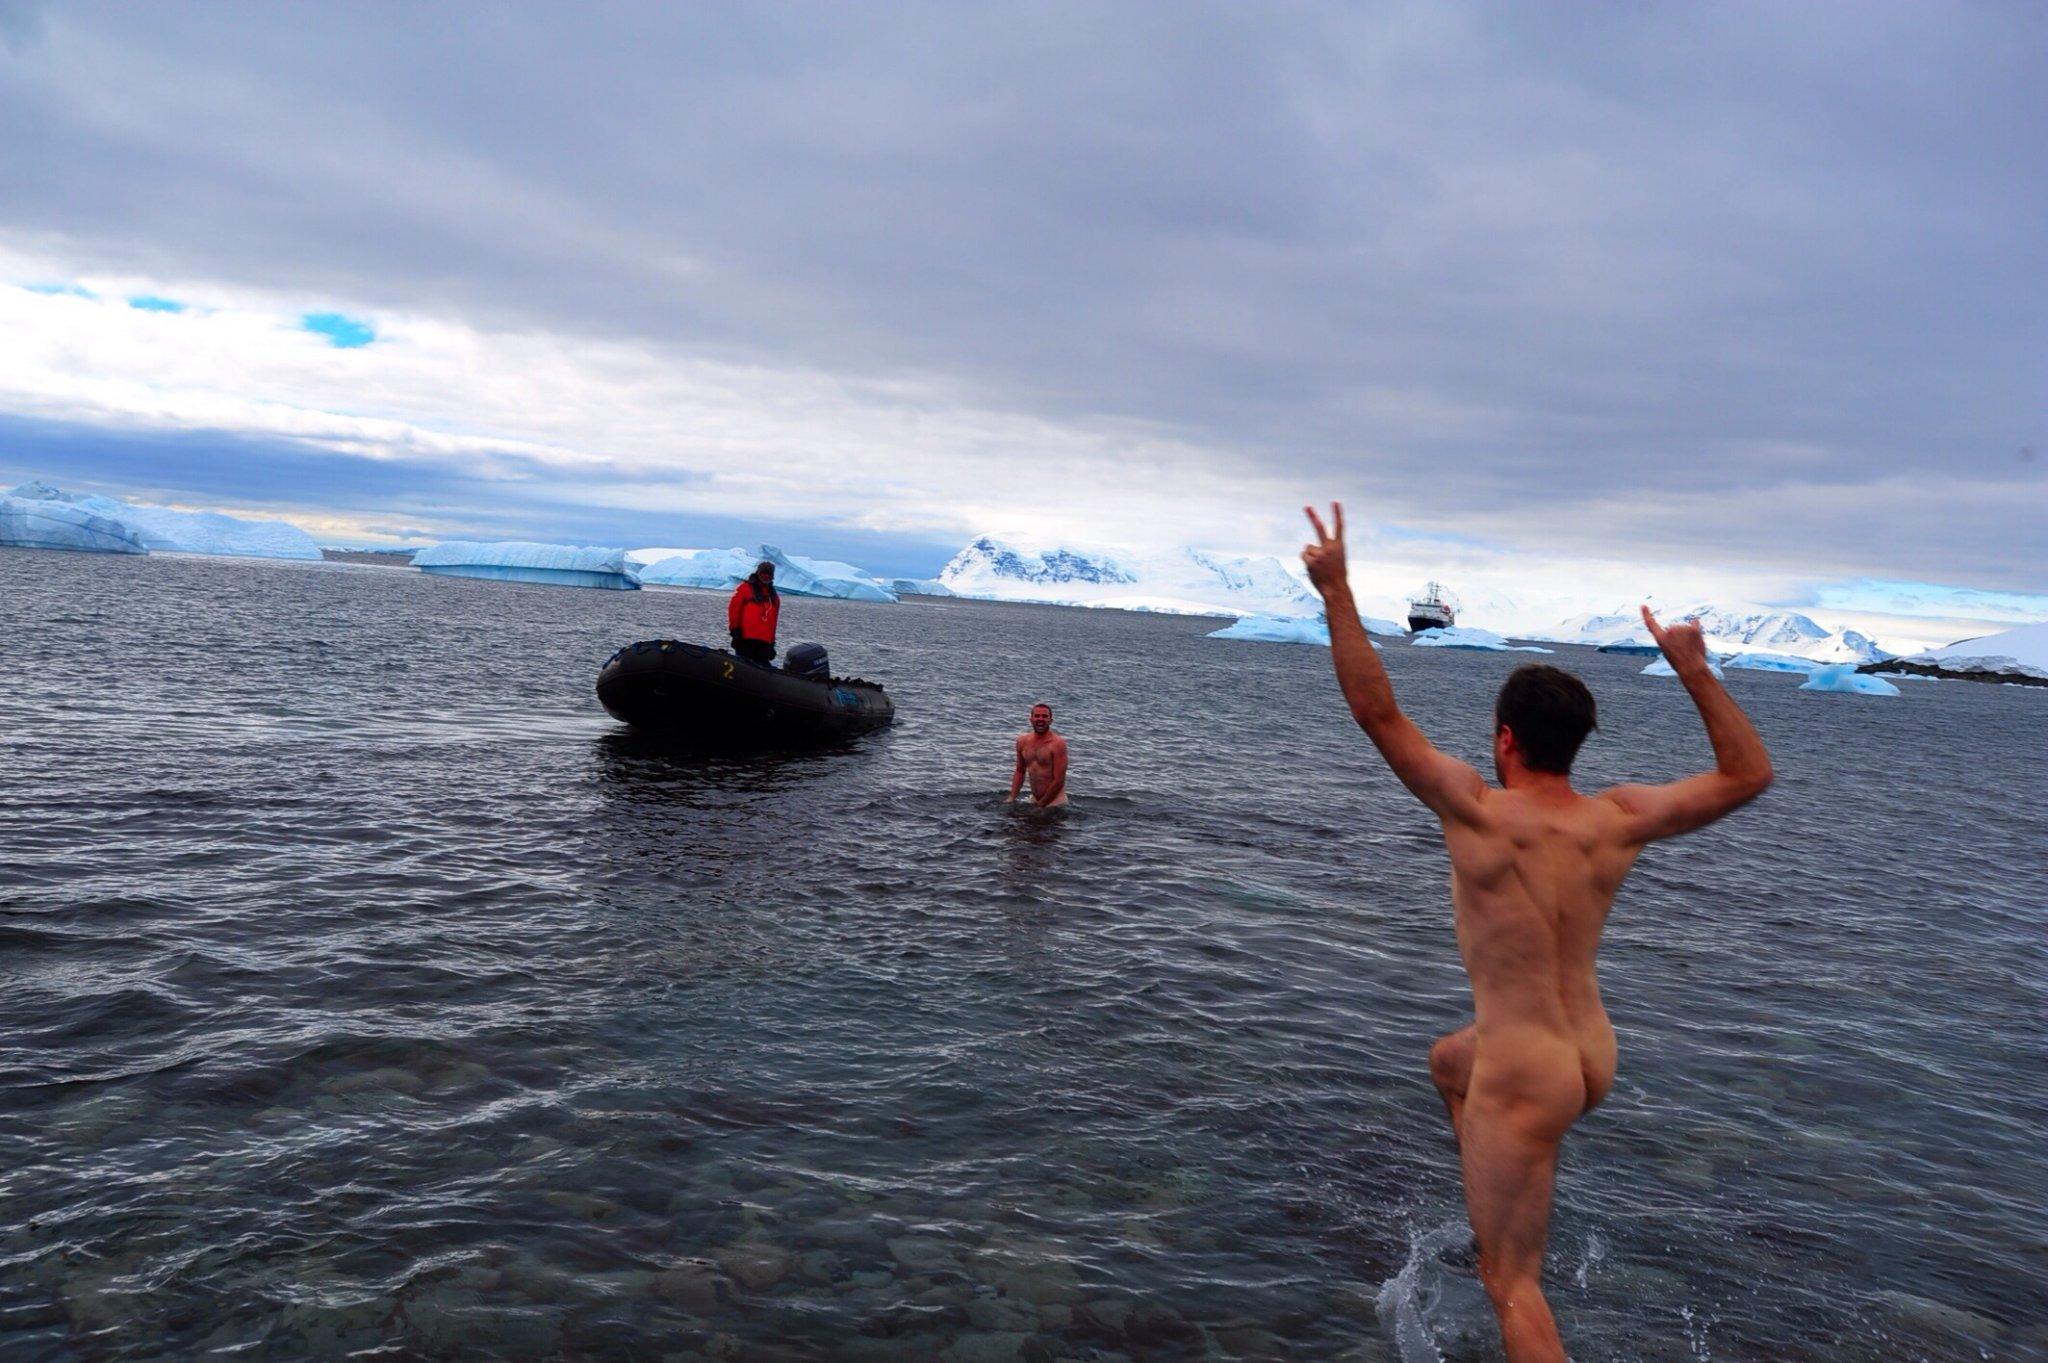 Skinny Dipping In Antarctica (NSFW)